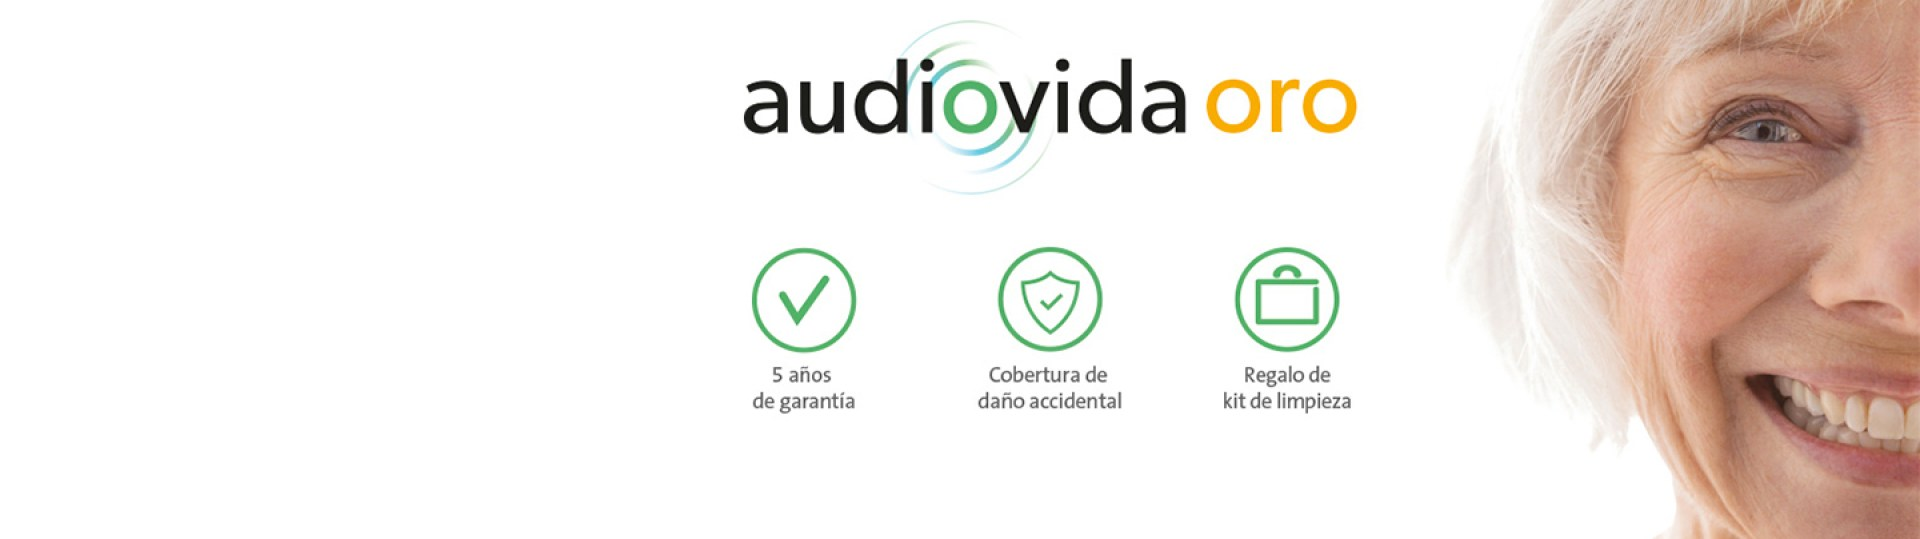 federopticos lupus audiología audiovida